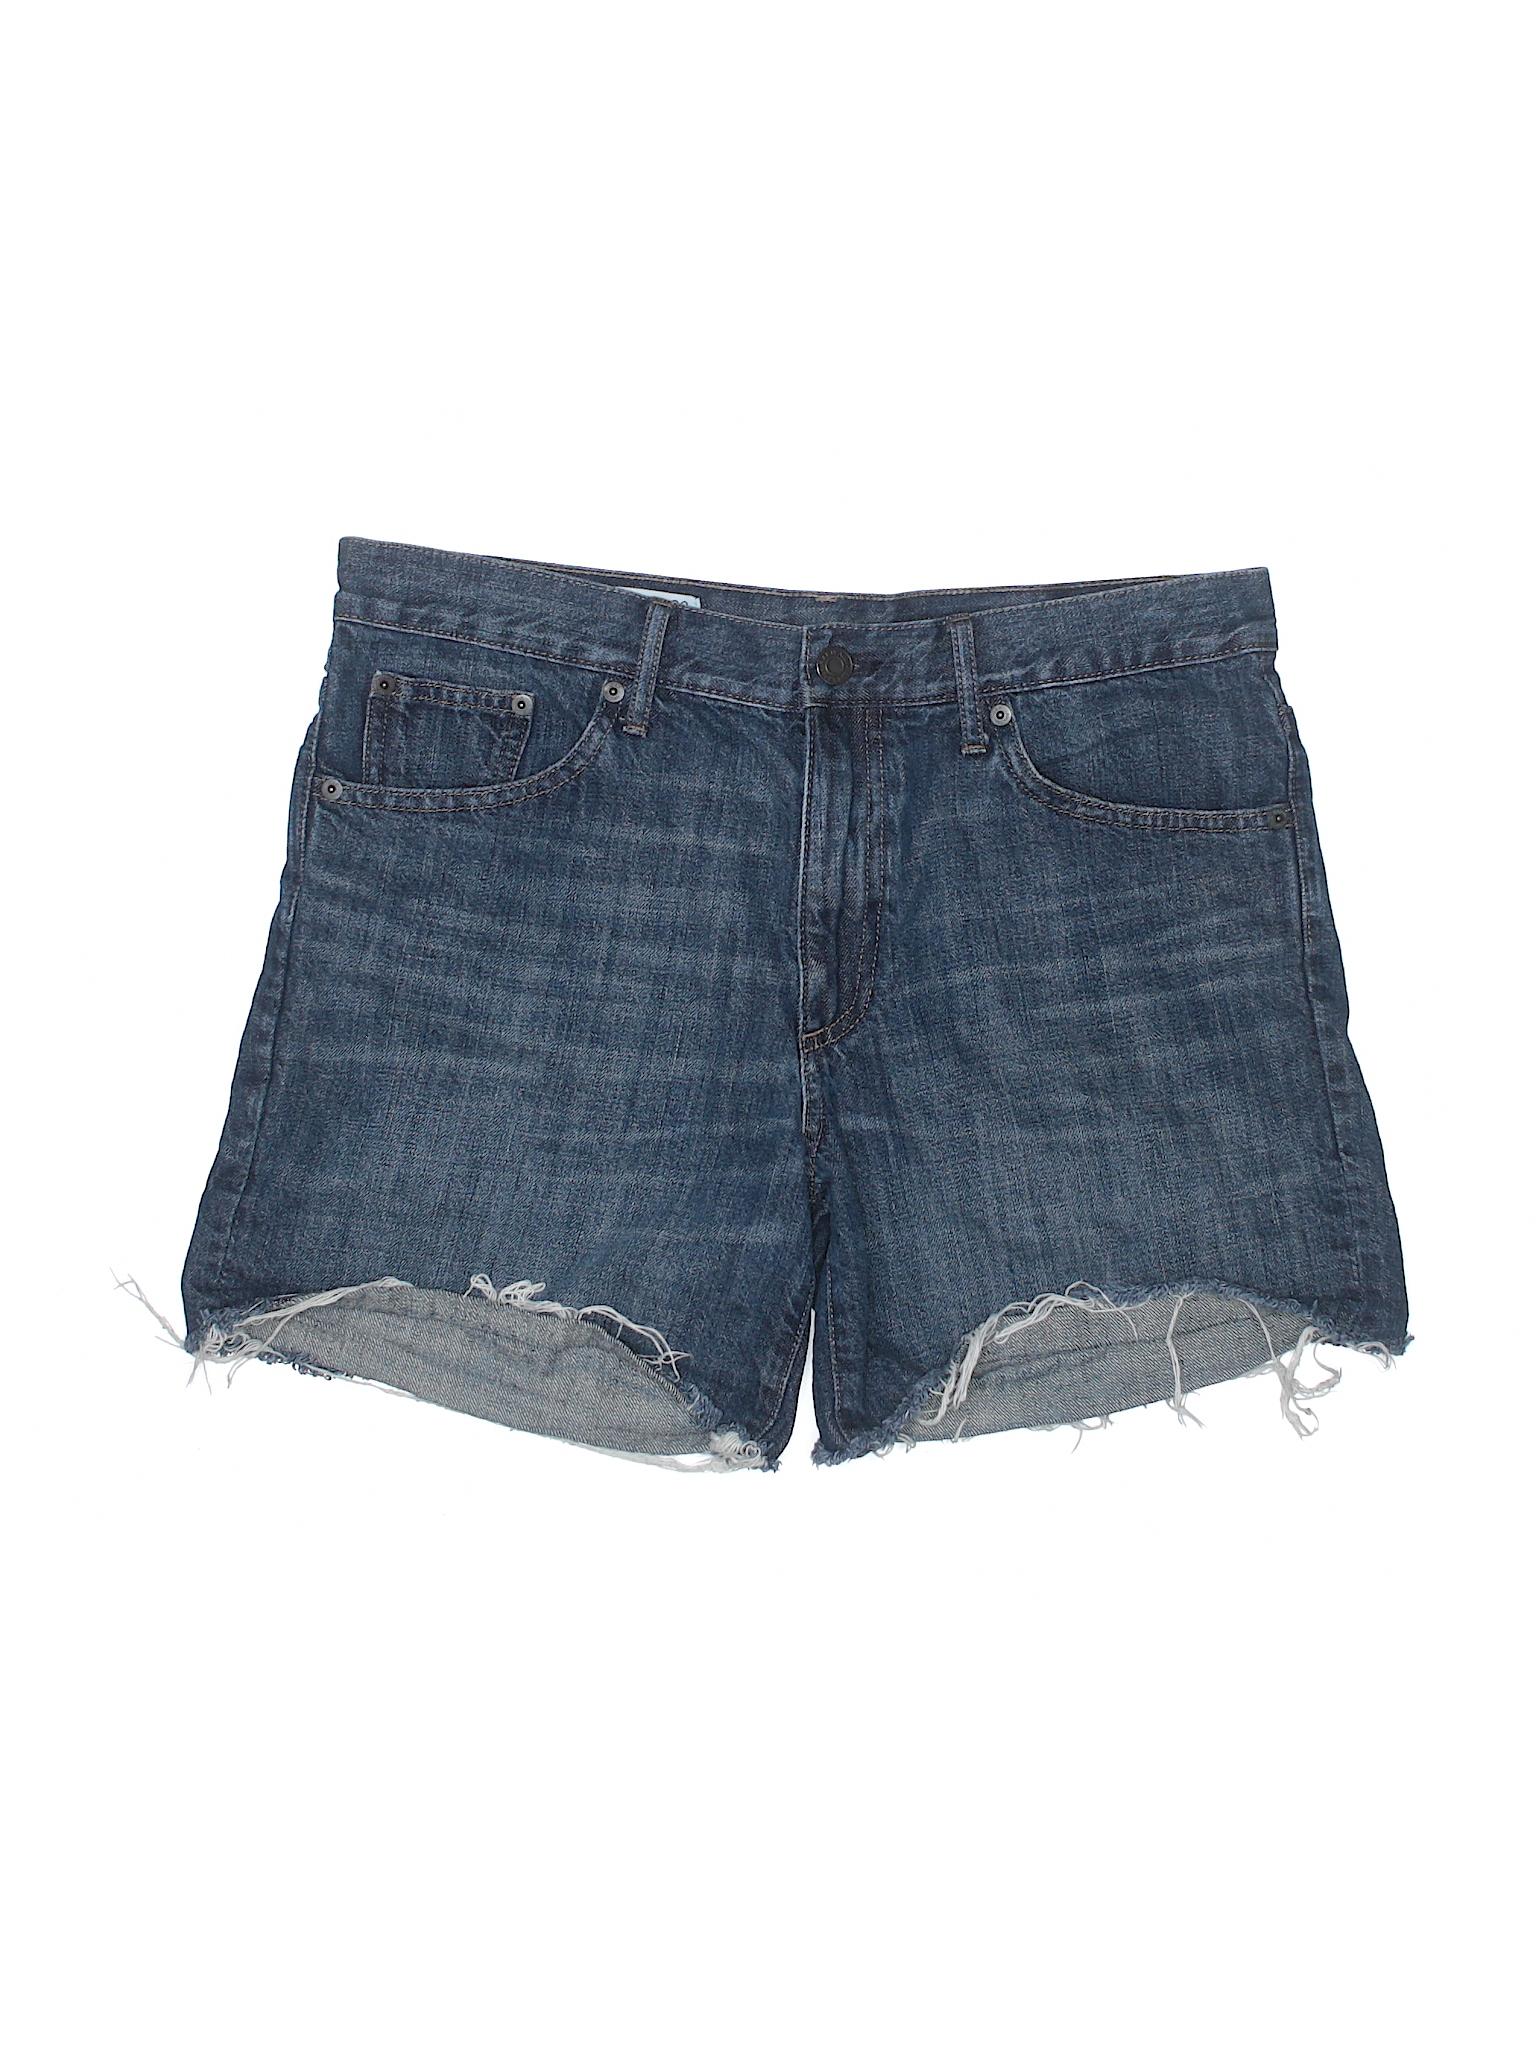 Boutique Gap Shorts Boutique Denim Gap winter Shorts winter Denim qwIEZU